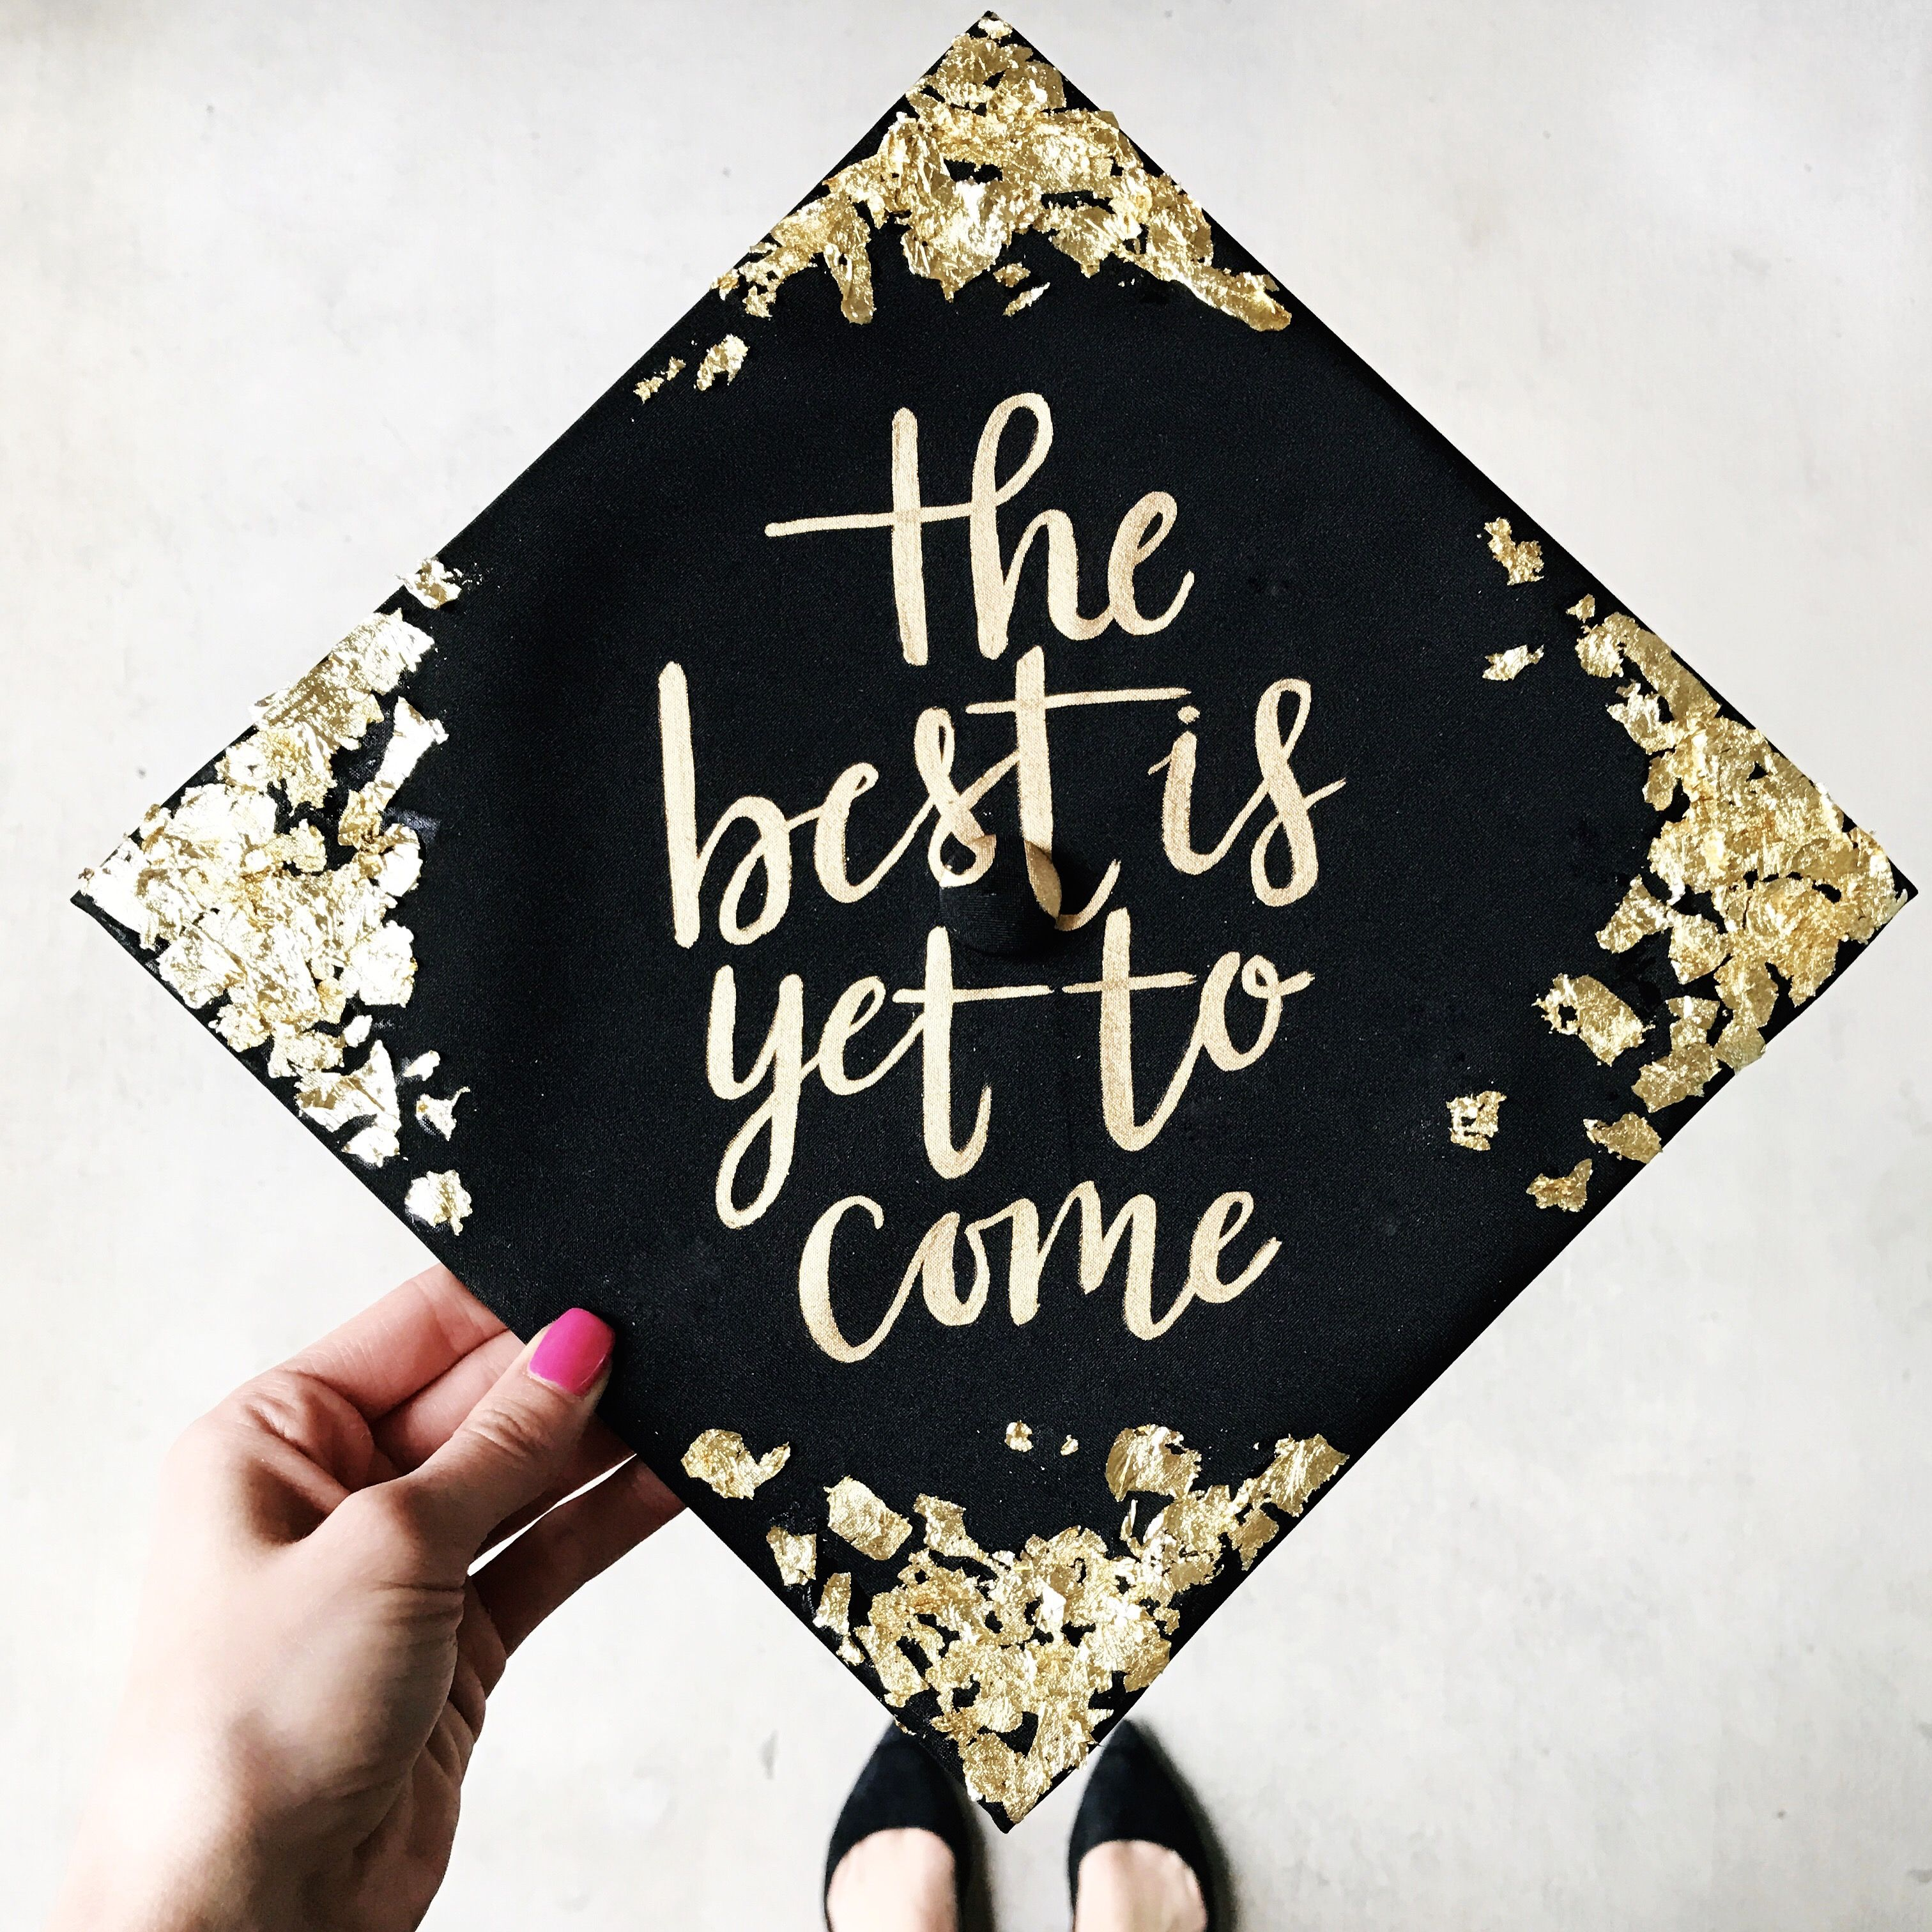 Painted graduation cap by Chera Creative! Instagram